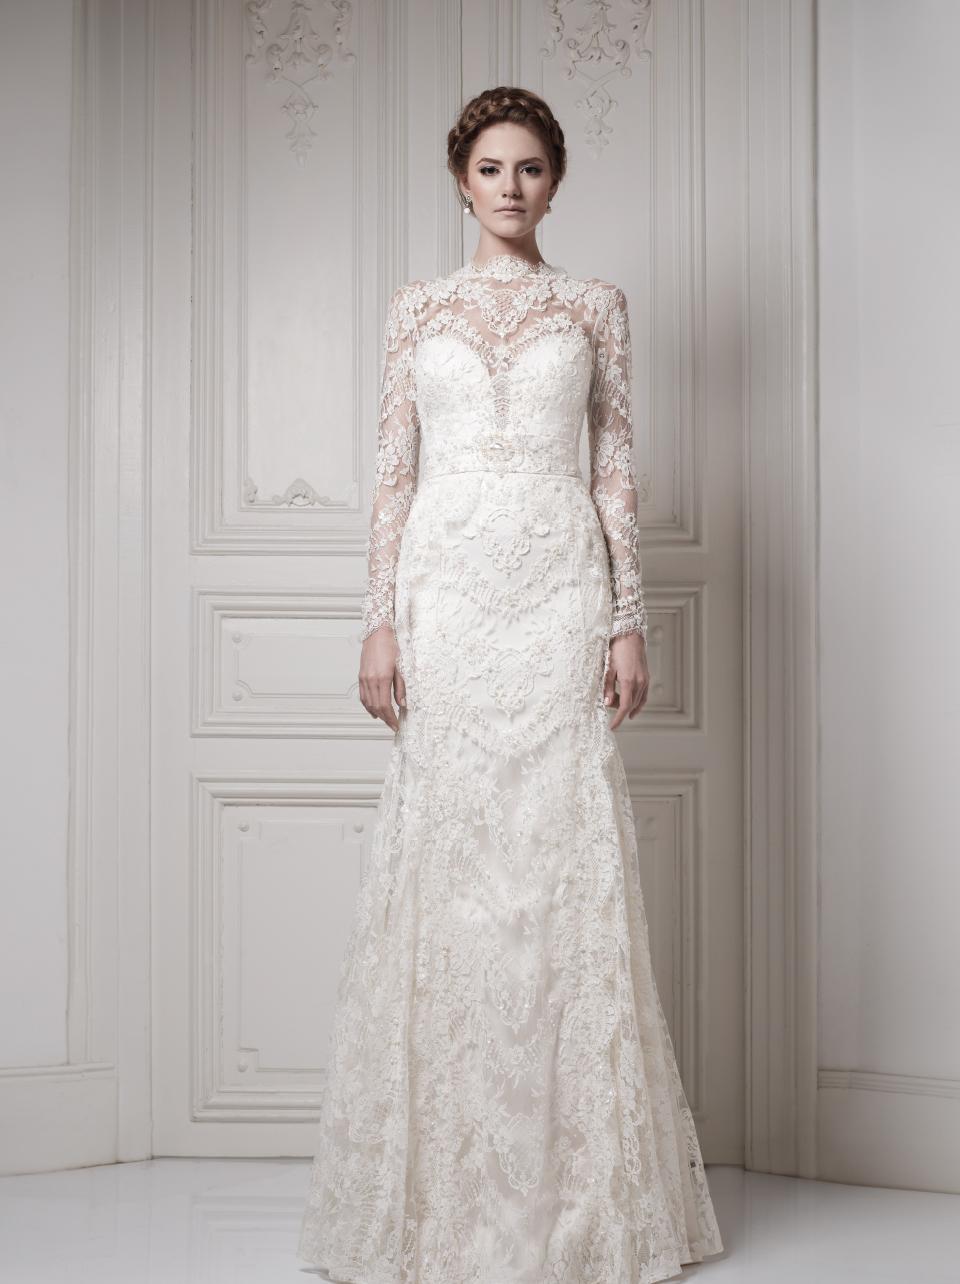 Exquisite Embellishment - Ersa Atelier Inocente Irene